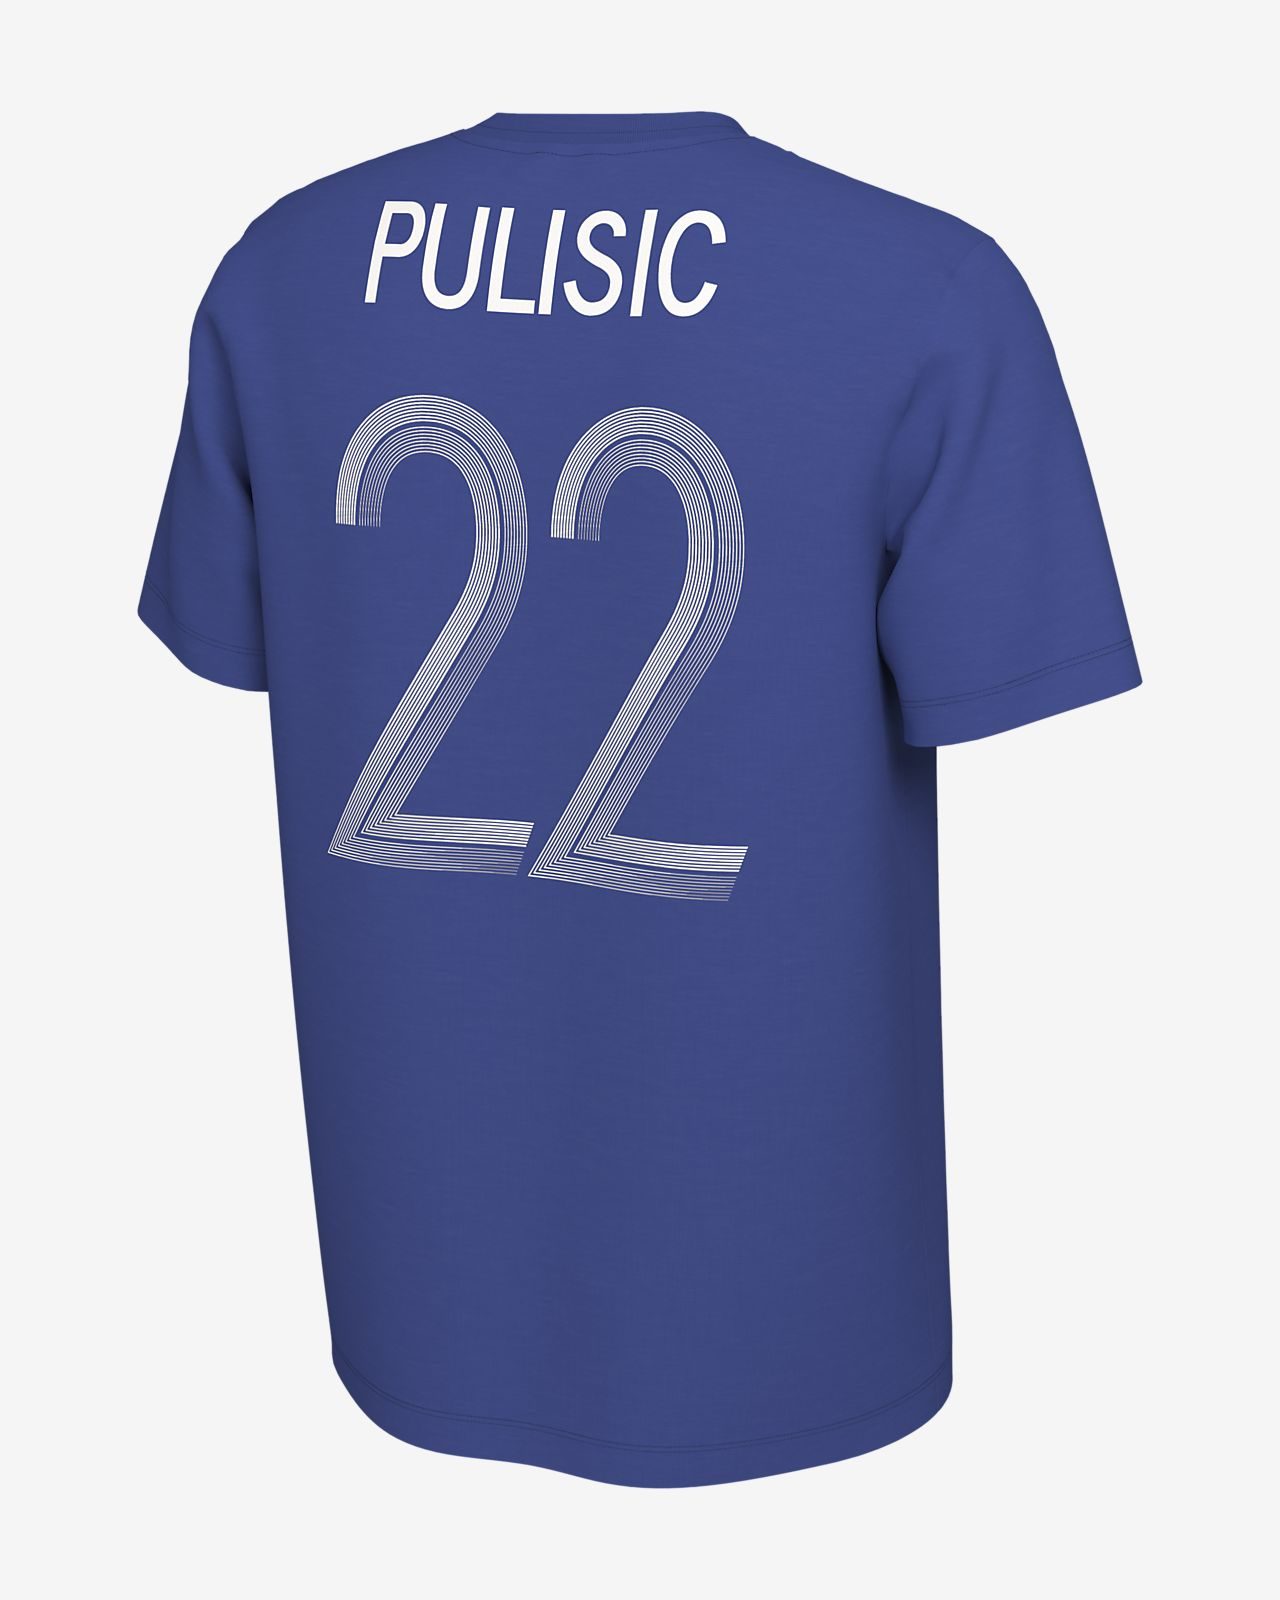 Chelsea FC (Pulisic) Men's Soccer T-Shirt